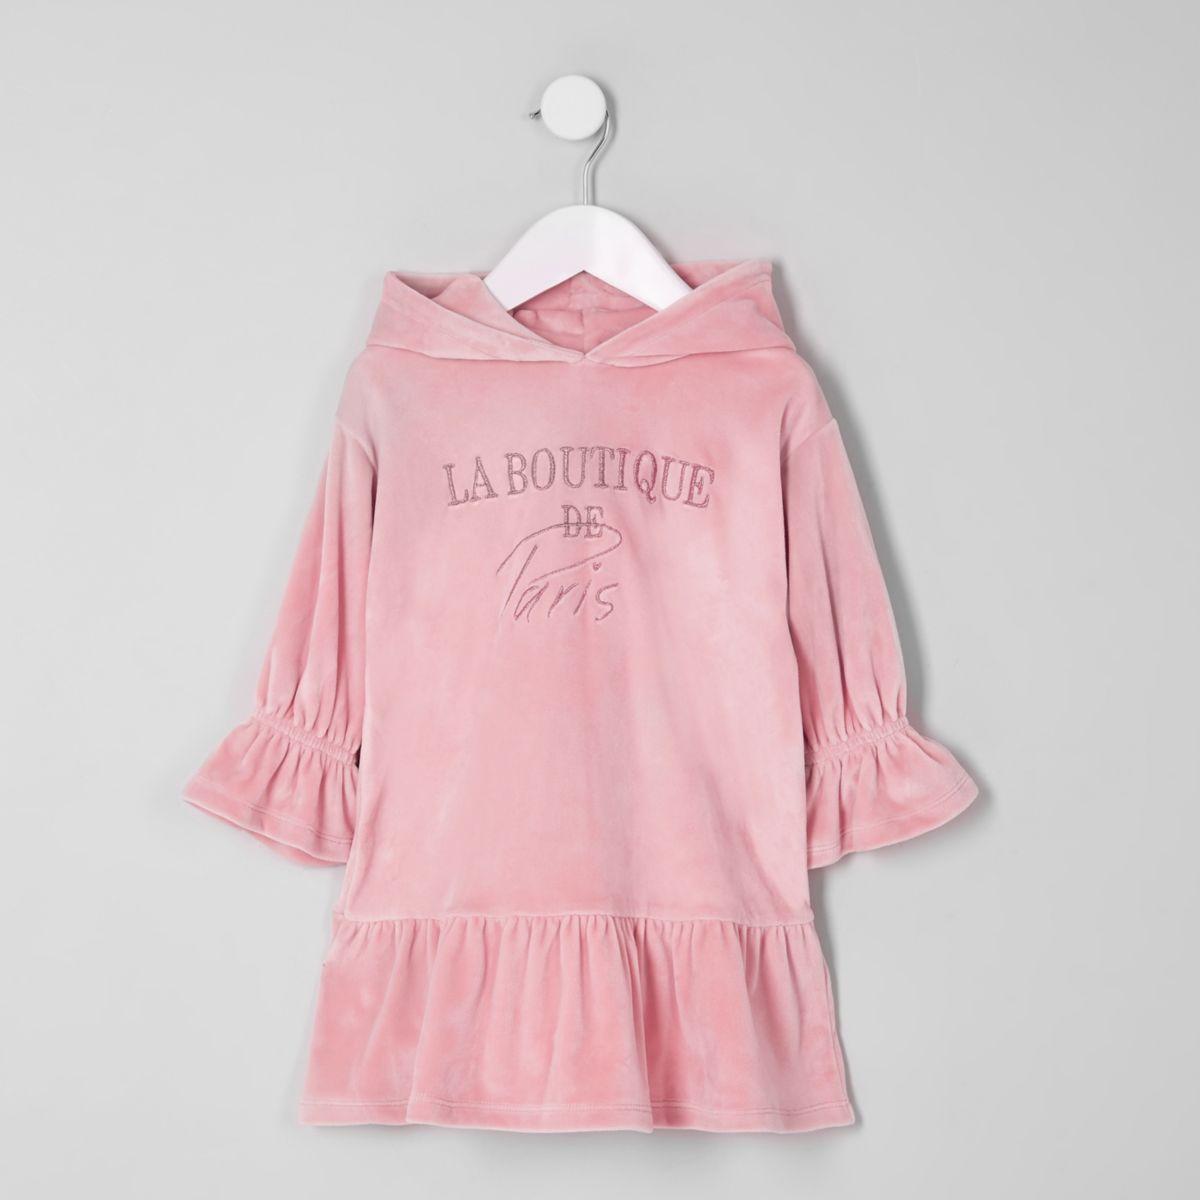 Mini girls pink 'boutique' sweatshirt dress